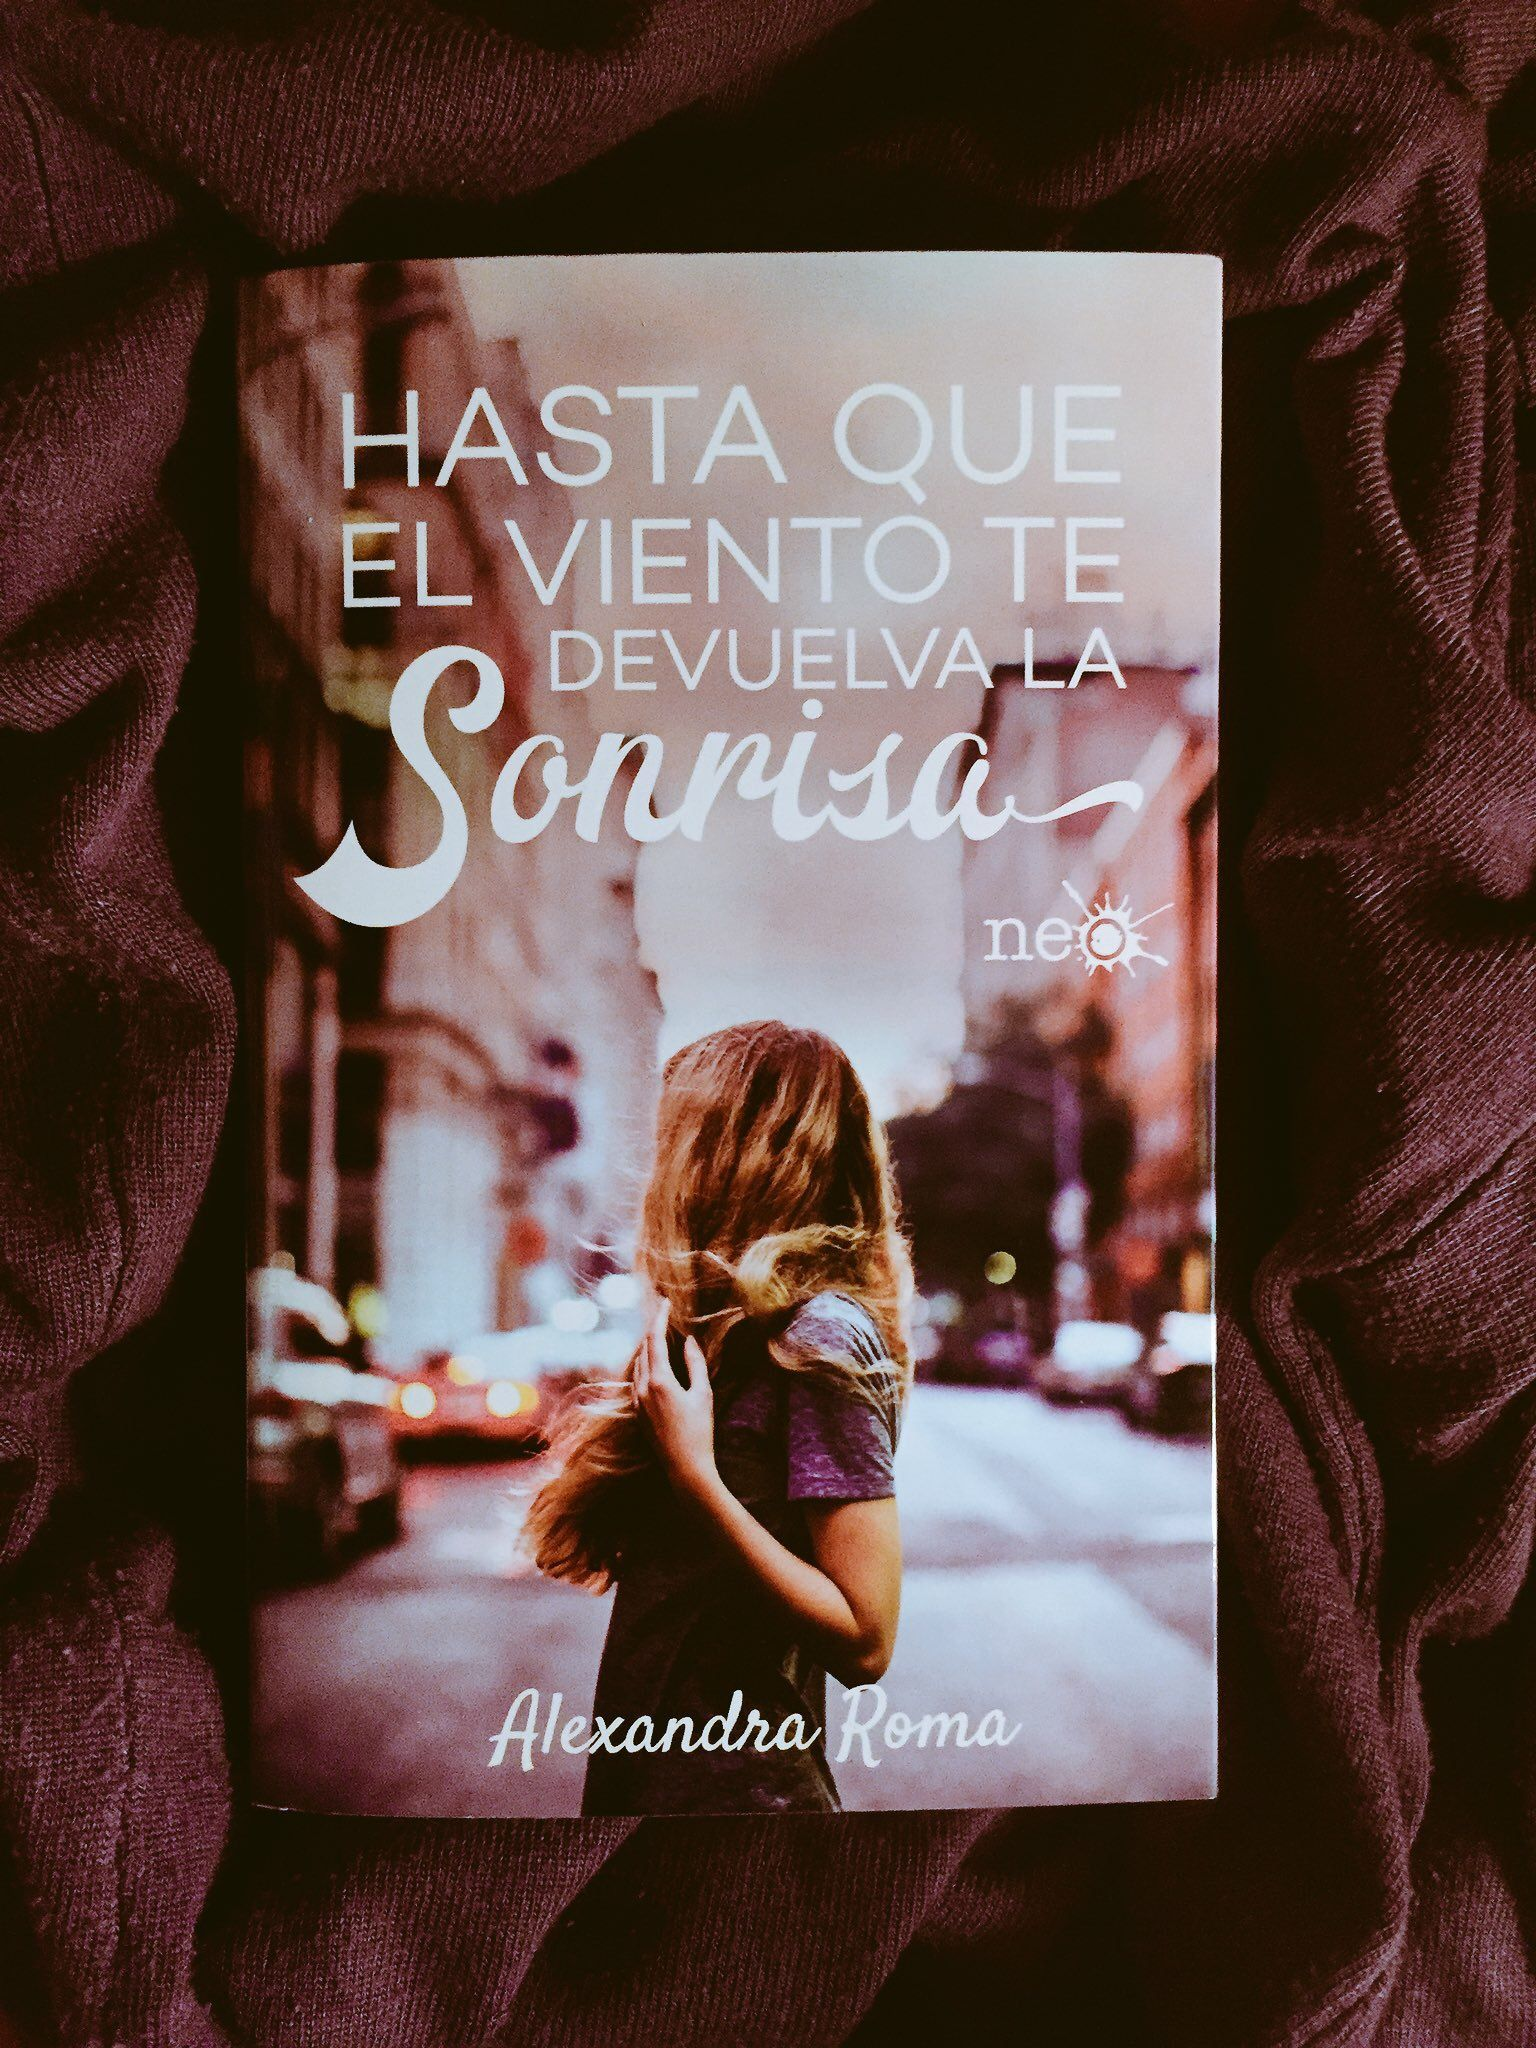 Hasta Que El Viento Te Devuelva La Sonrisa Alexandra Roma Books Book Cover Cover